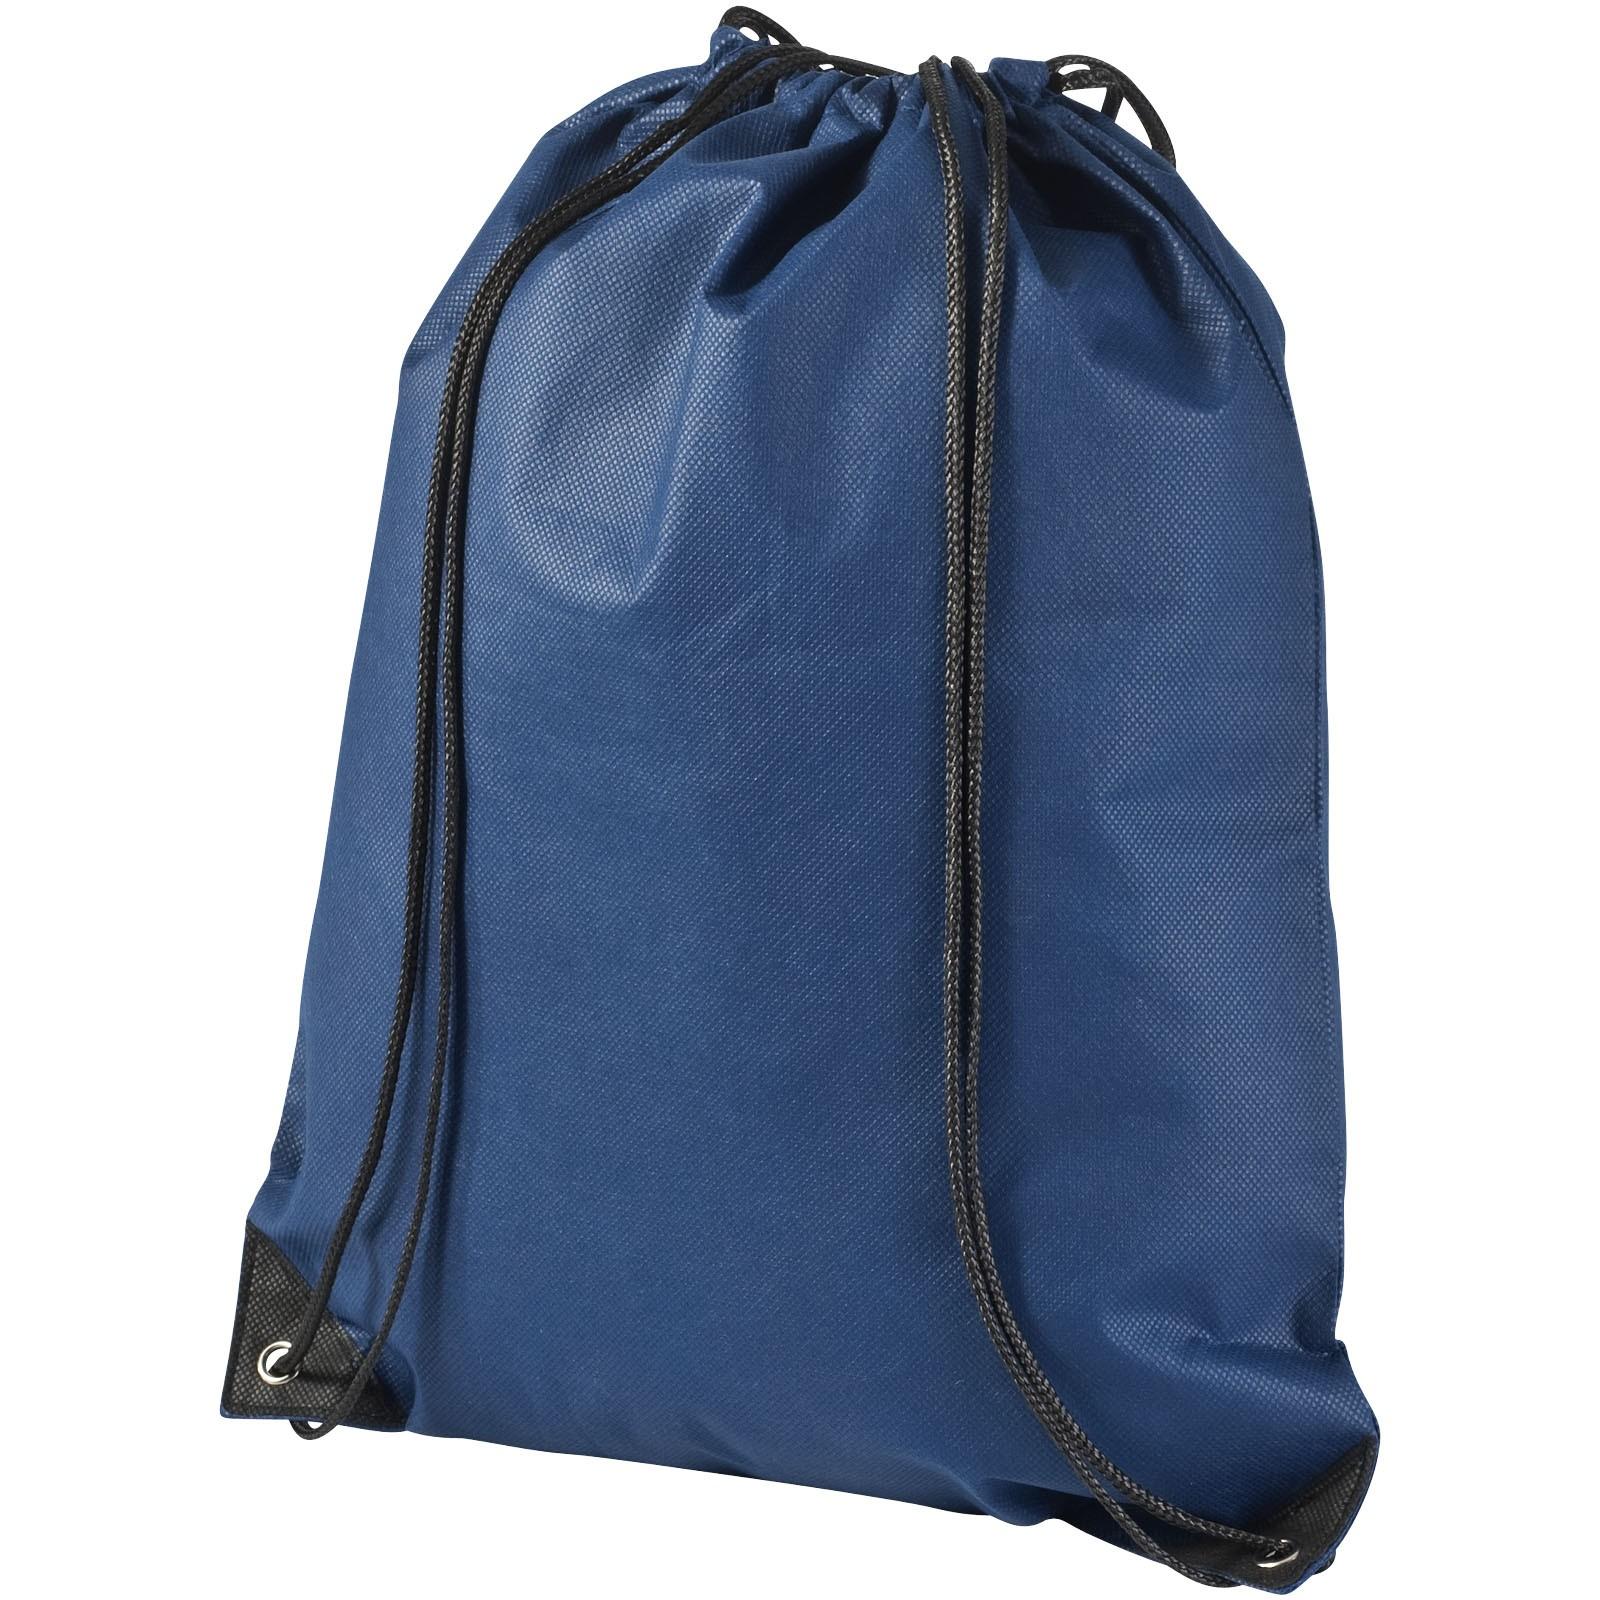 Evergreen non-woven drawstring backpack - Navy